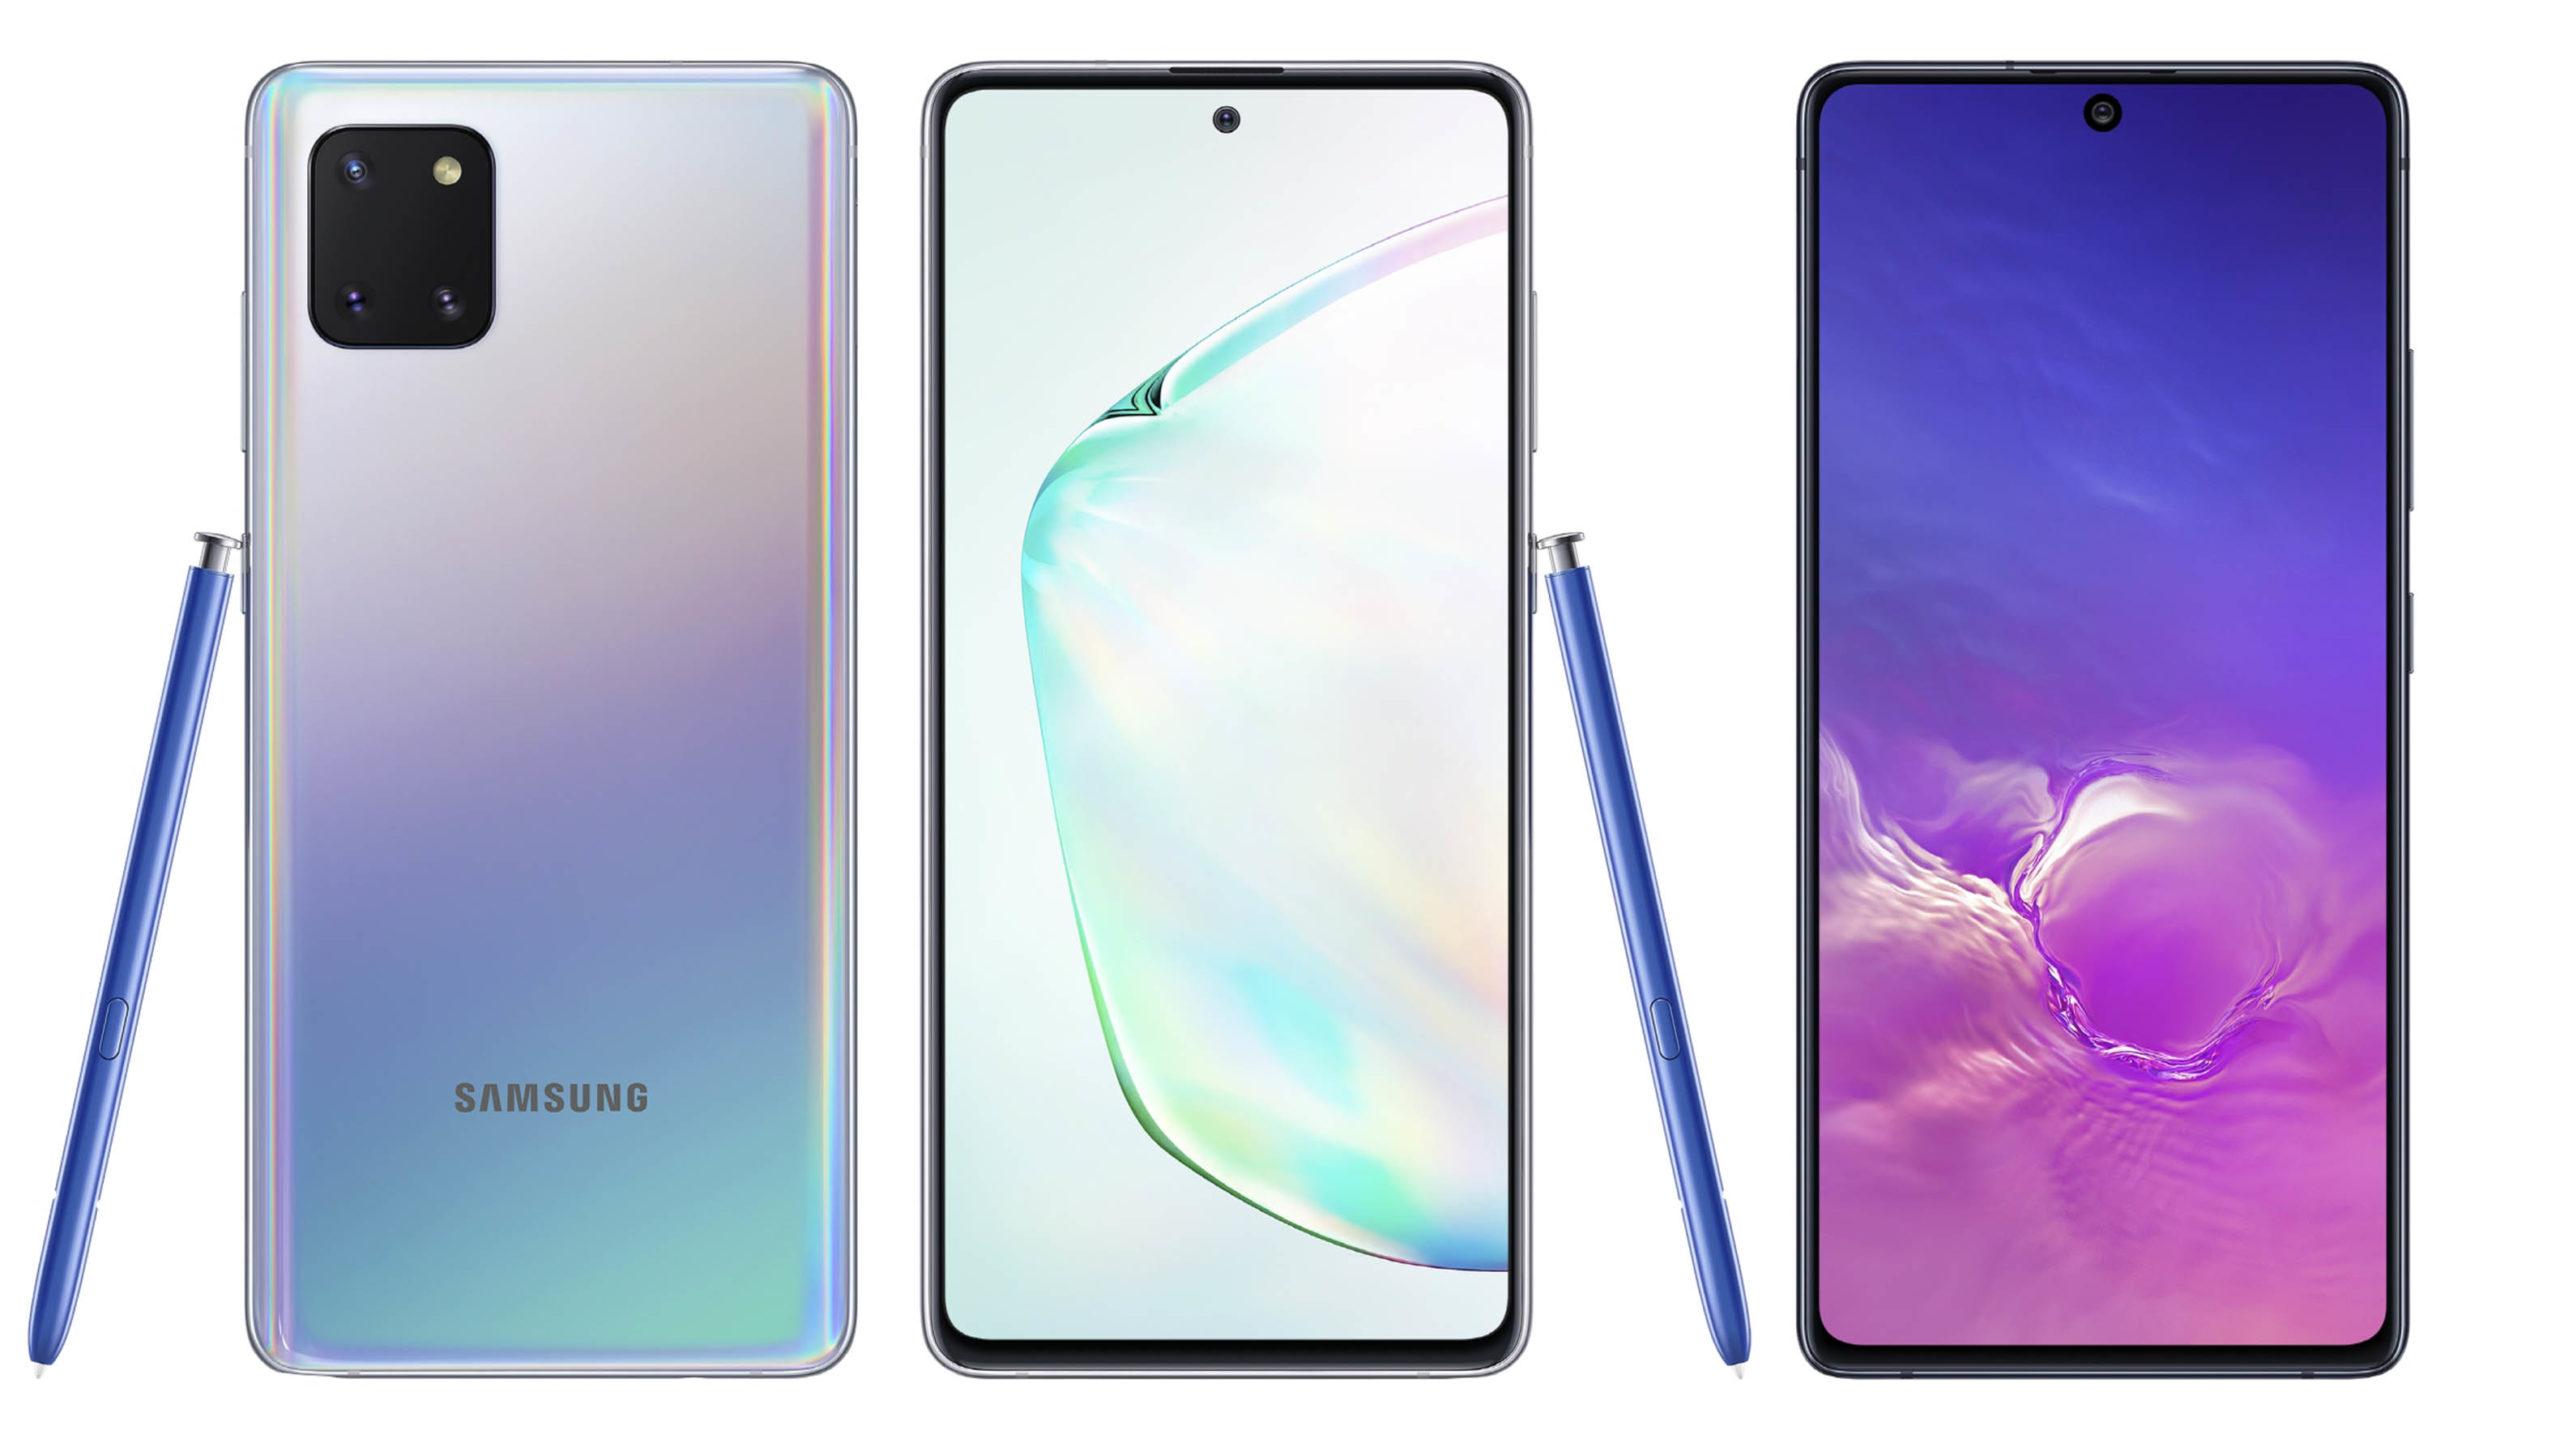 Samsung Galaxy Note 10 Lite and S10 Lite